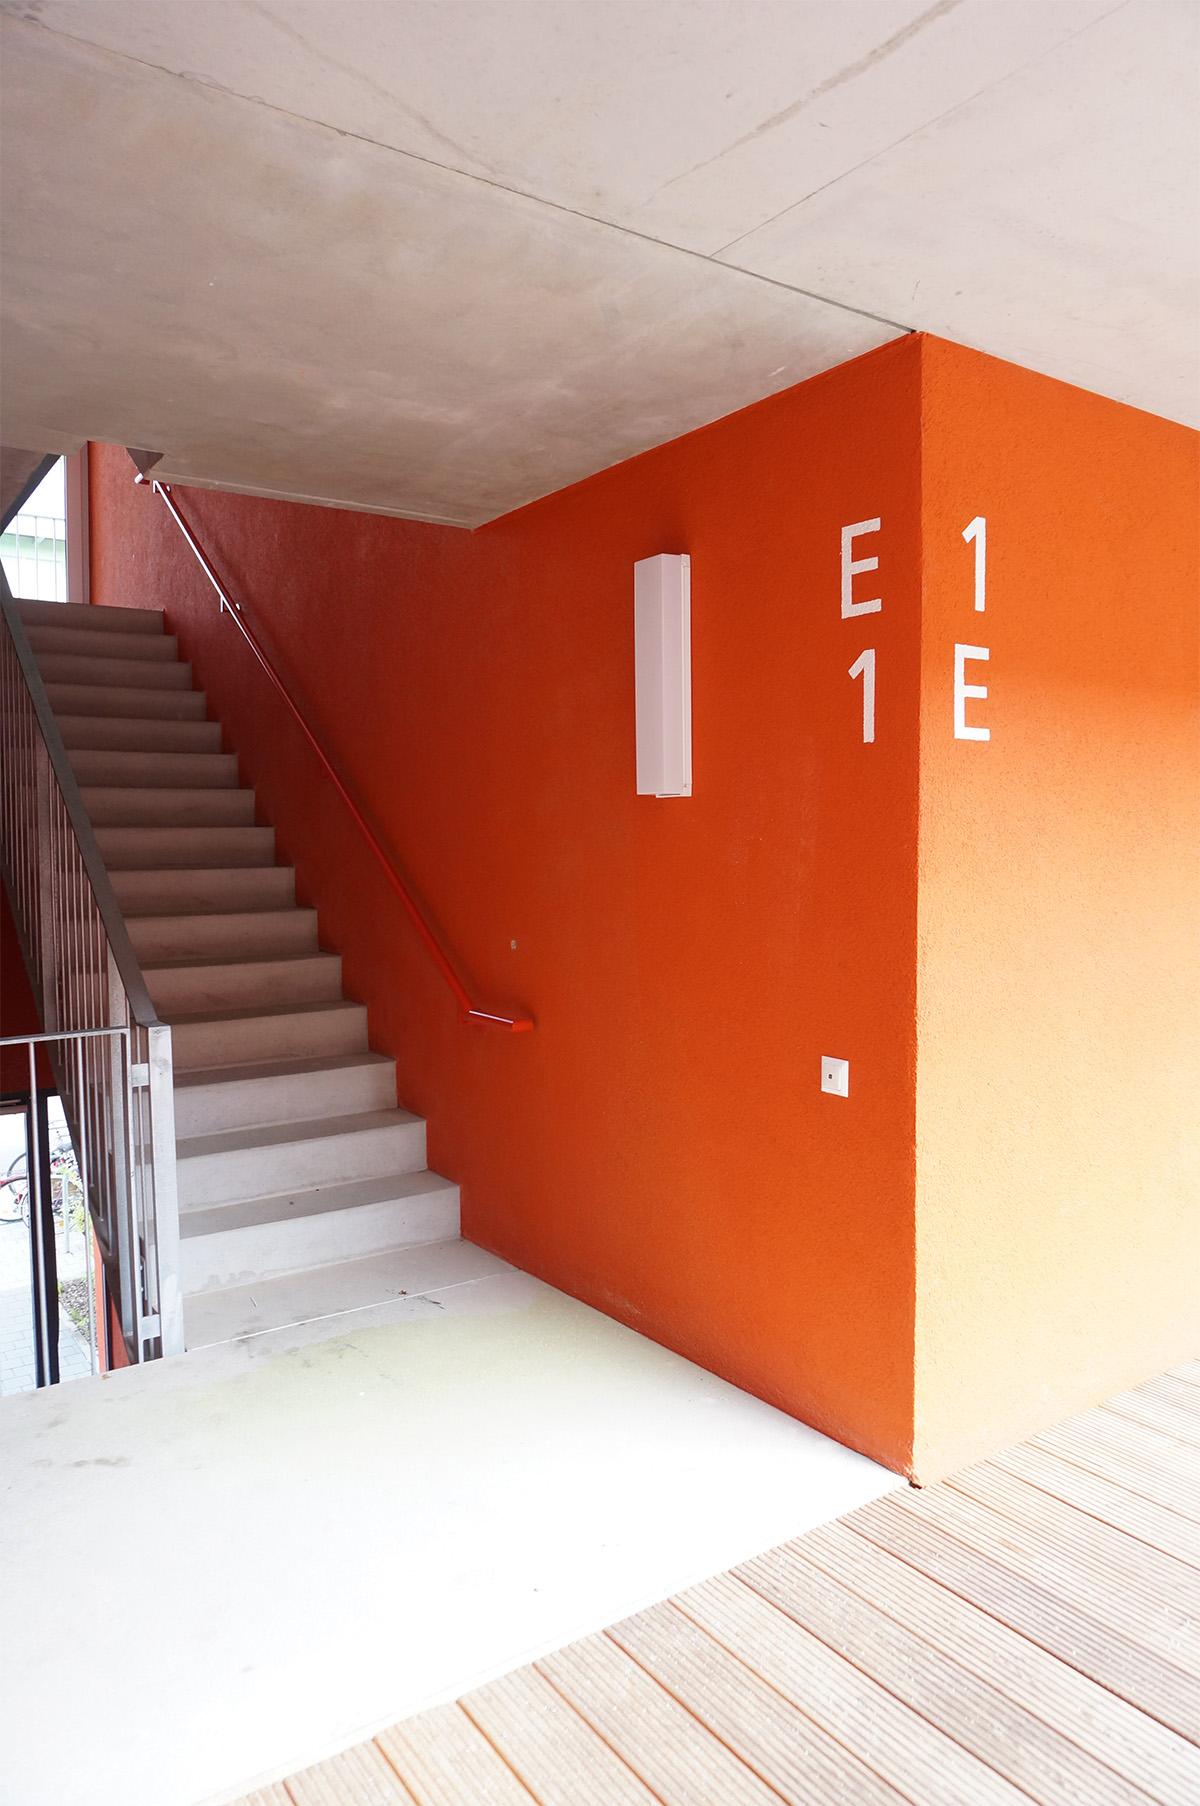 104 kompaktblock mayer ffm architekten. Black Bedroom Furniture Sets. Home Design Ideas